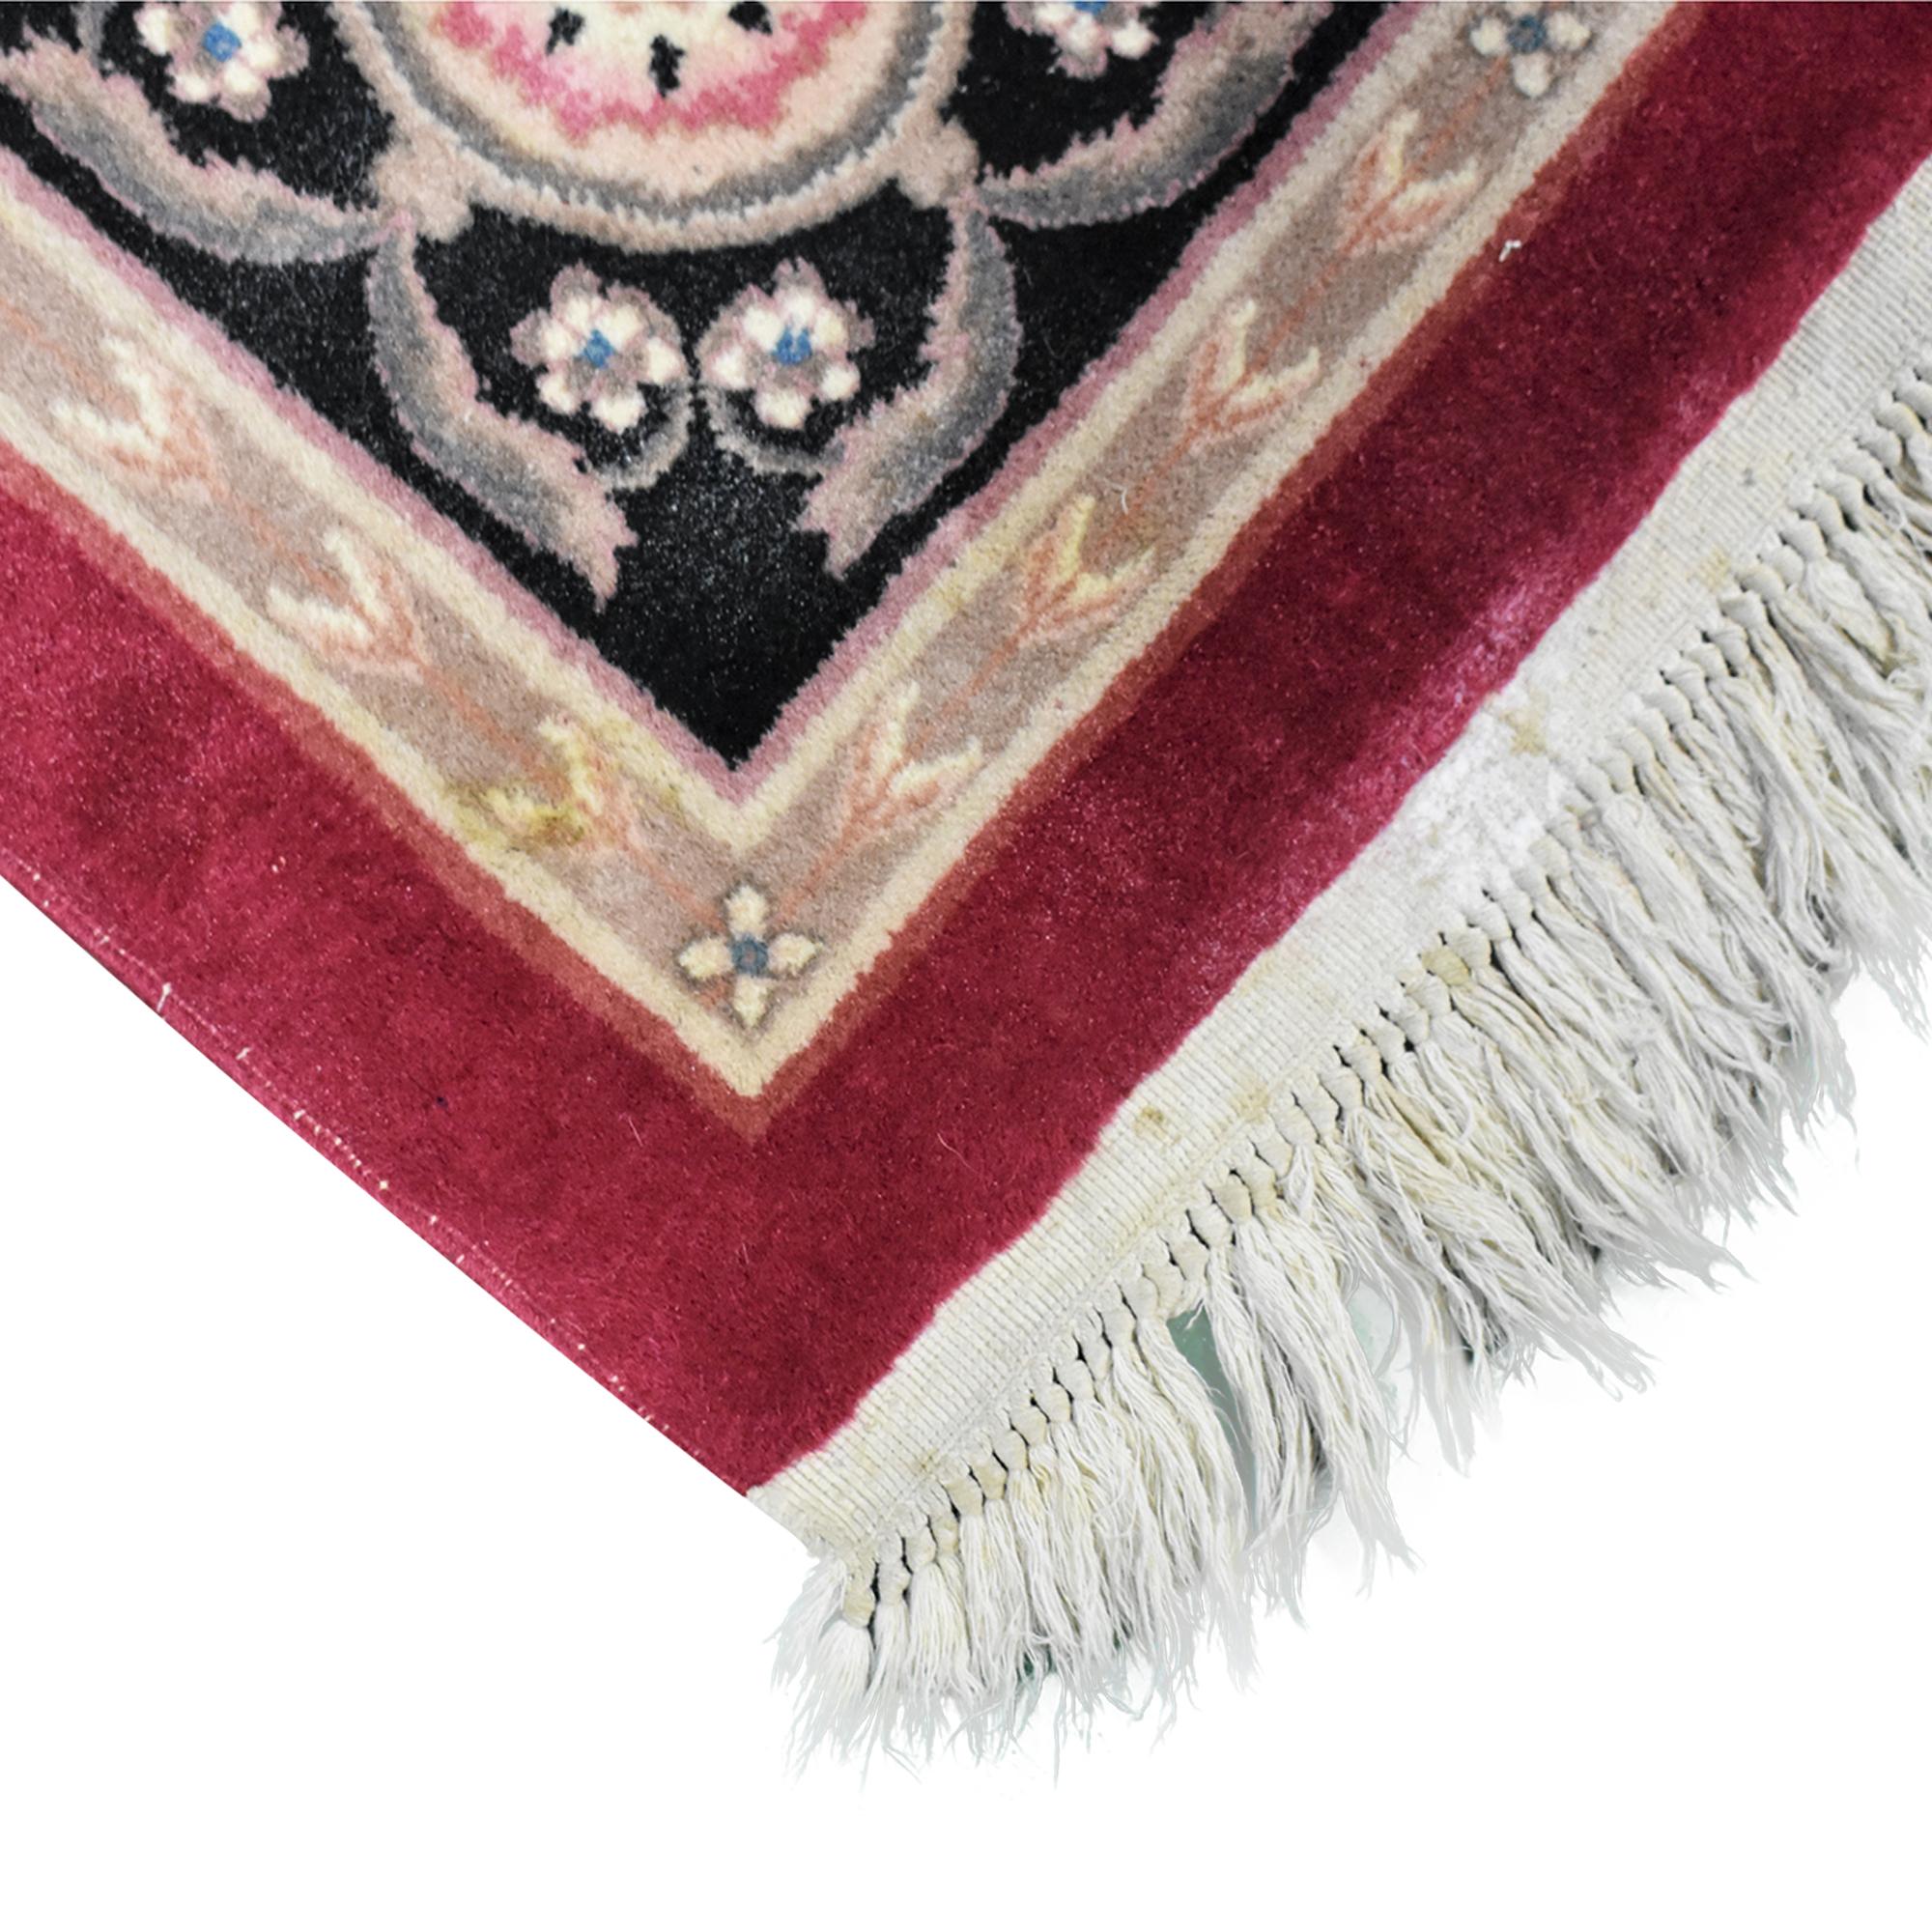 ABC Carpet & Home ABC Carpet & Home Classic Patterned Rug Decor